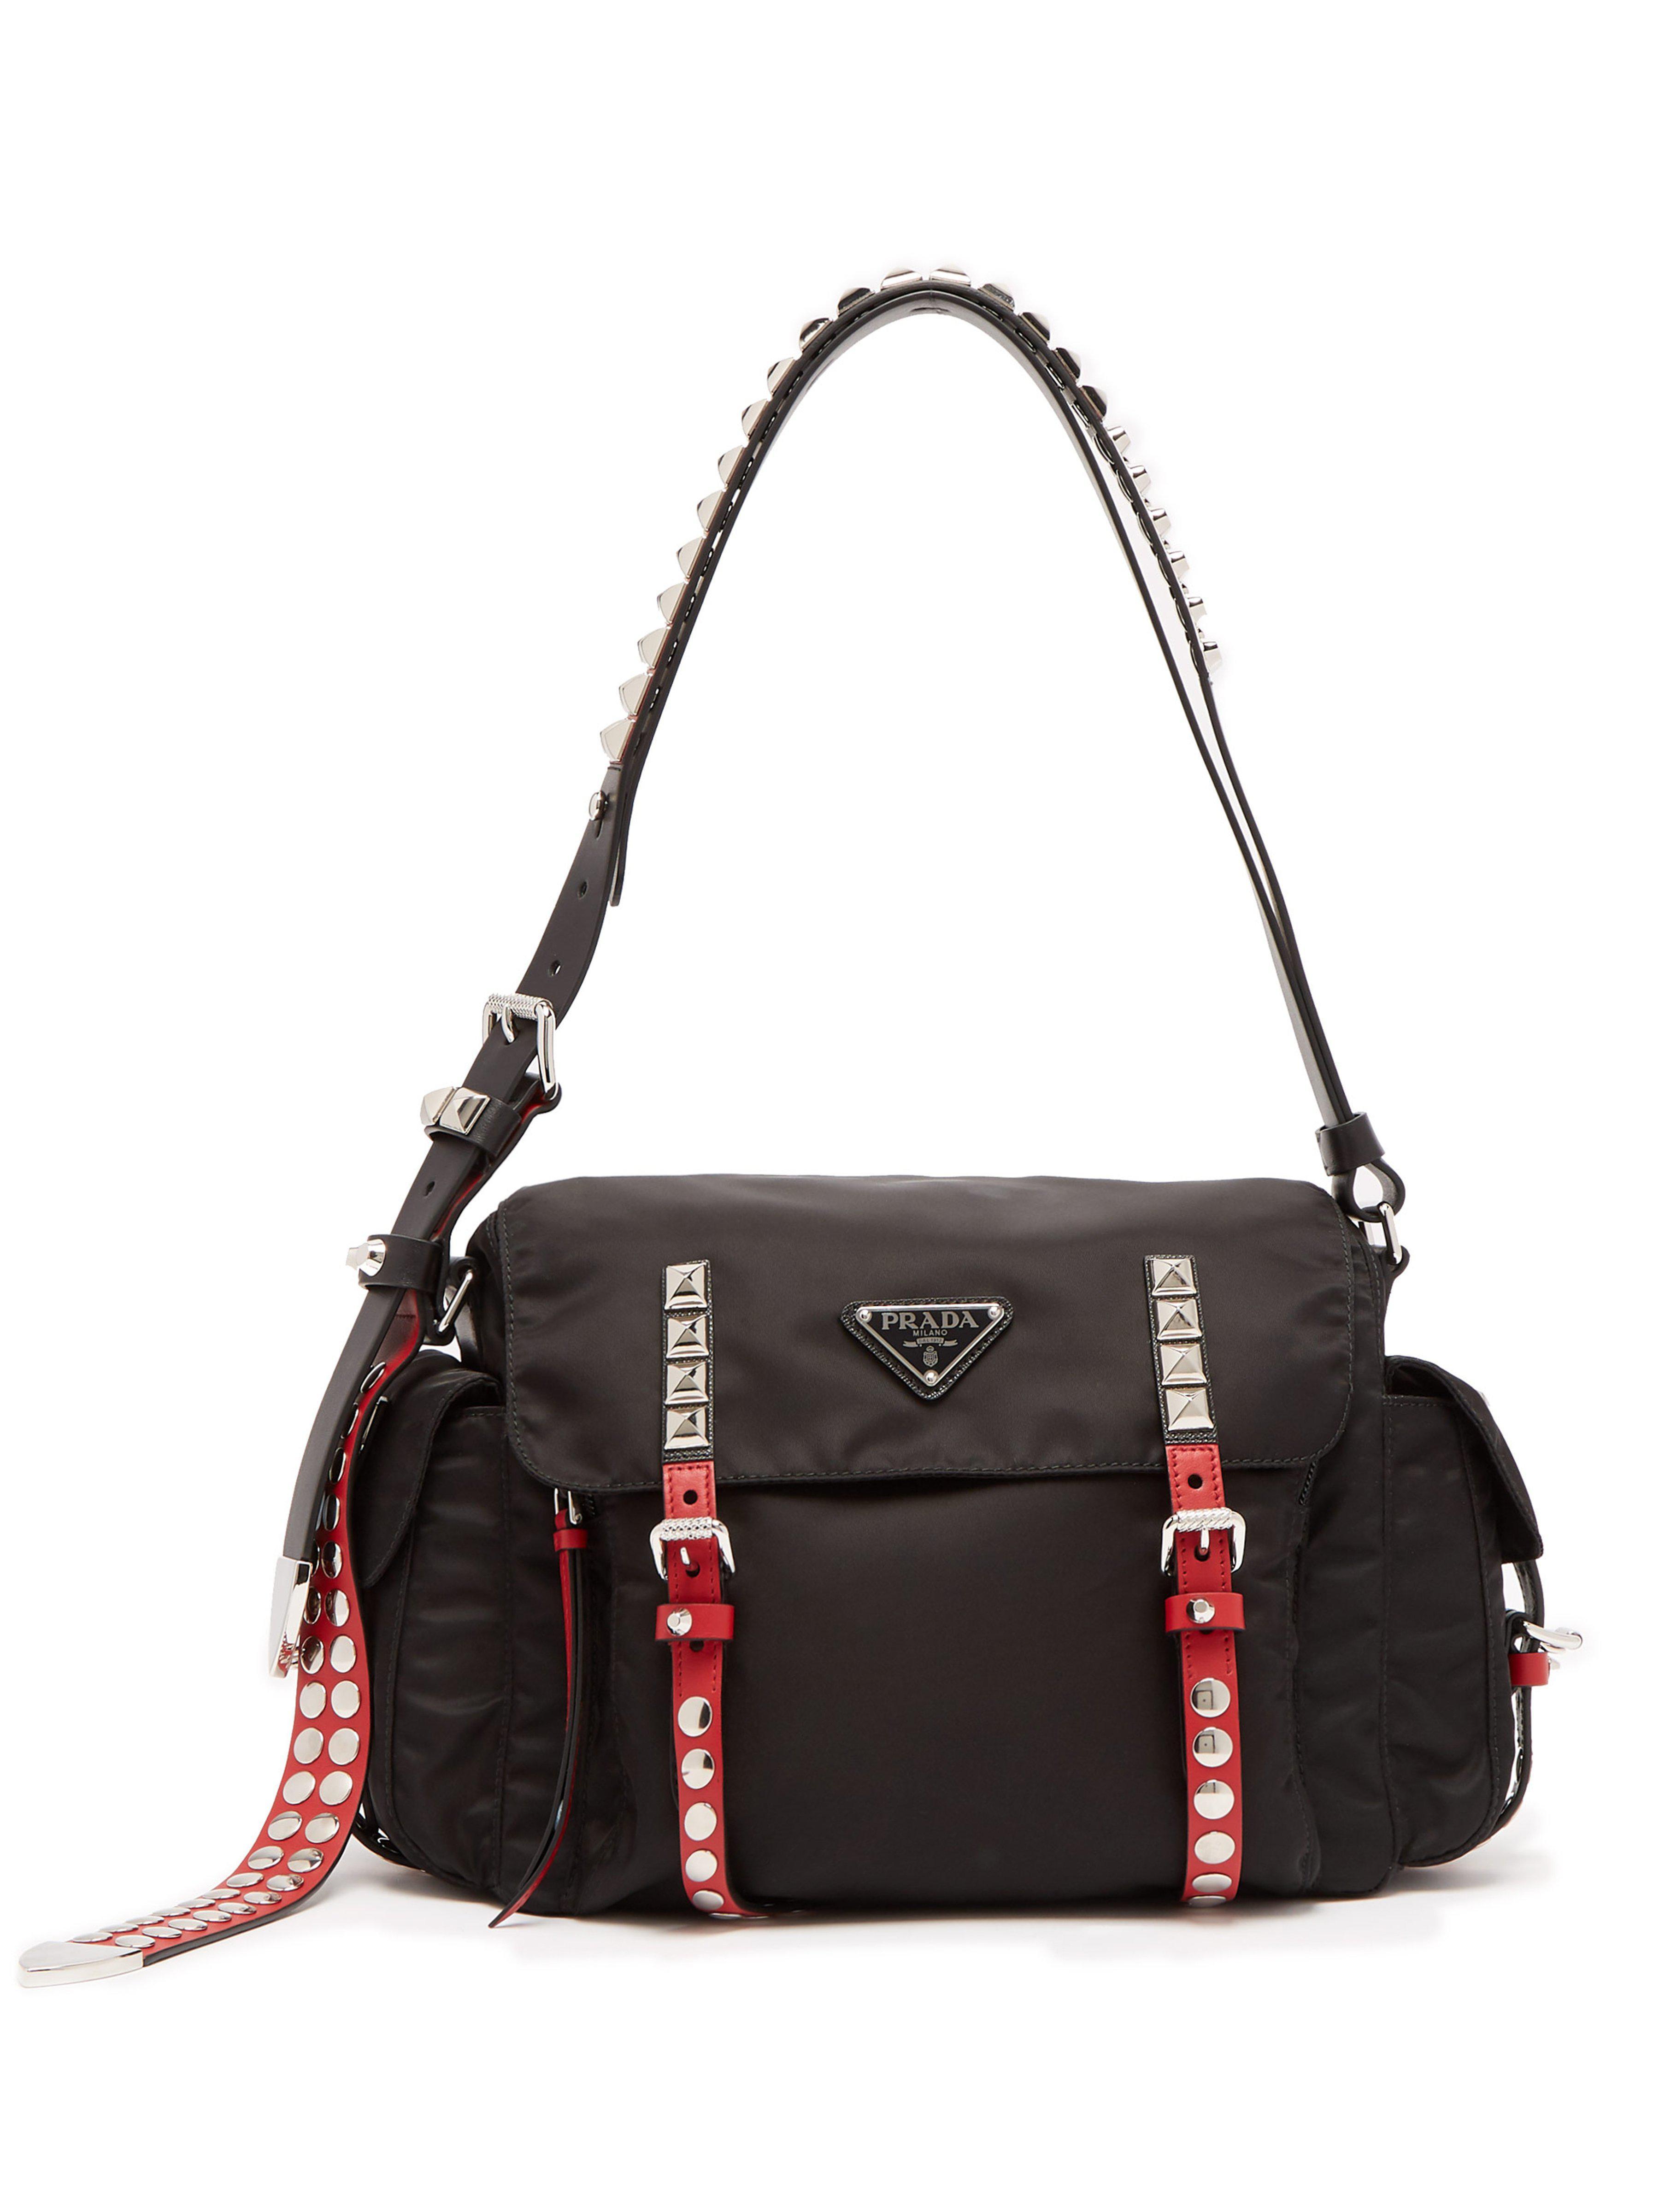 Prada - Black Vela Leather Trimmed Cross Body Bag - Lyst. View fullscreen 0d1c961c1cc61